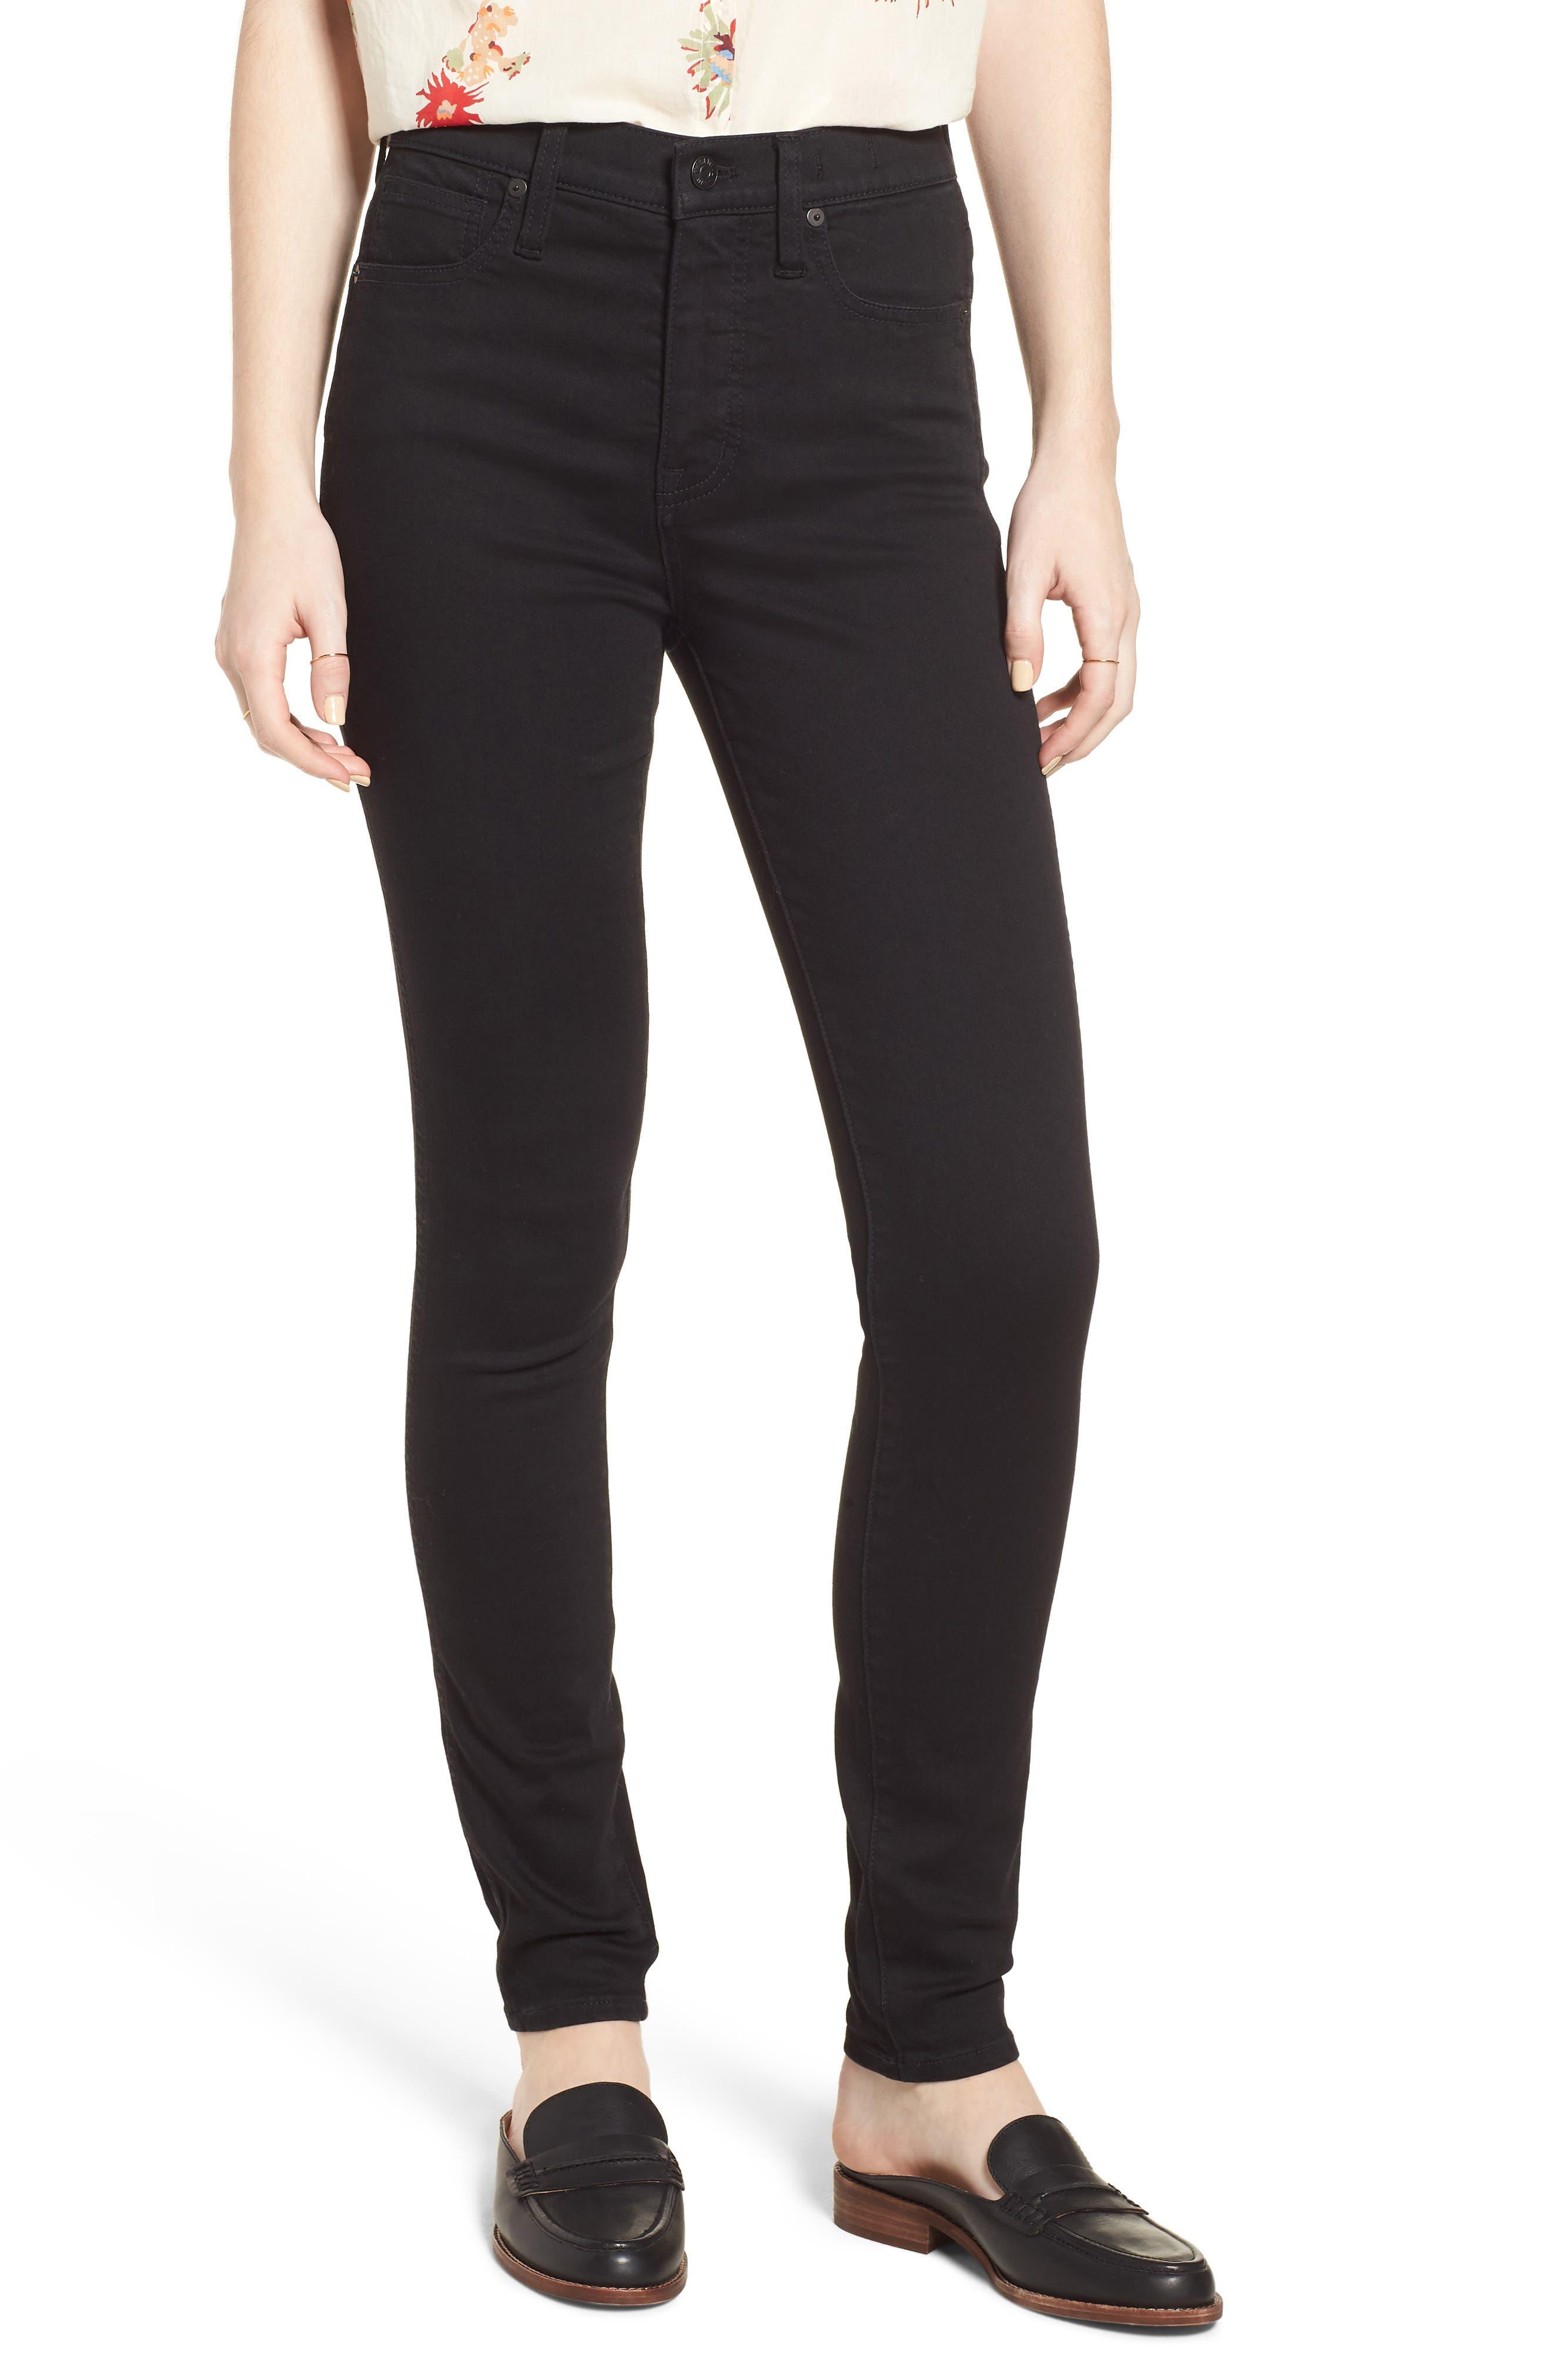 MADEWELL, 10-Inch High Waist Skinny Jeans, Main thumbnail 1, color, 001